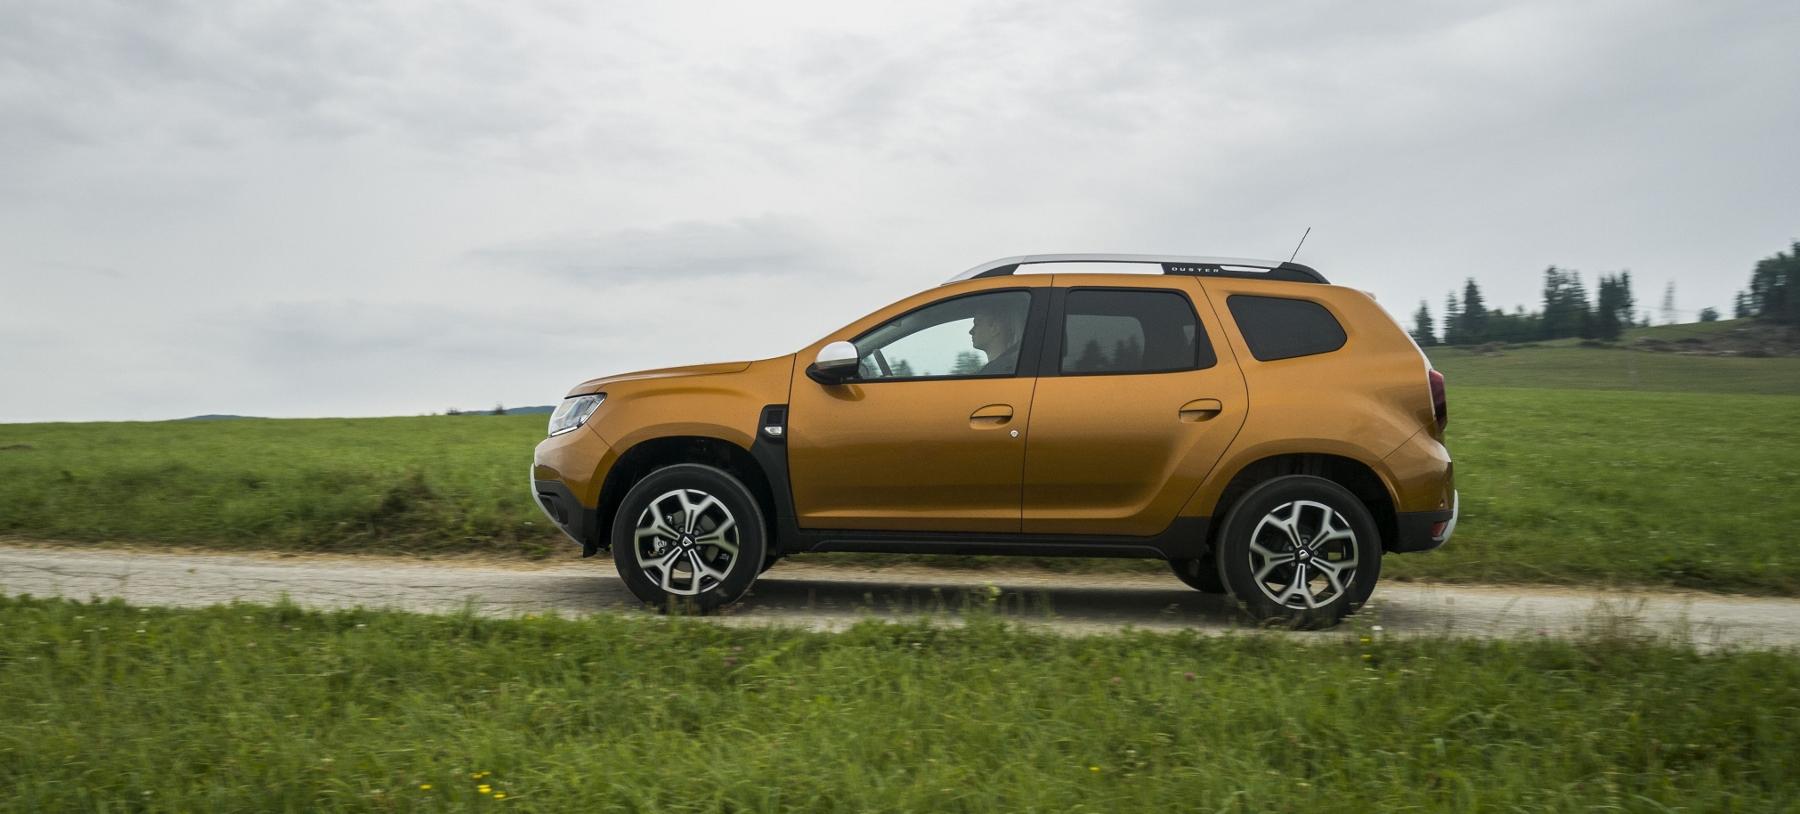 Test: Dacia Duster LPG je voľbou rozumu zWWhgd48A6 dacia-duster-lpg-10